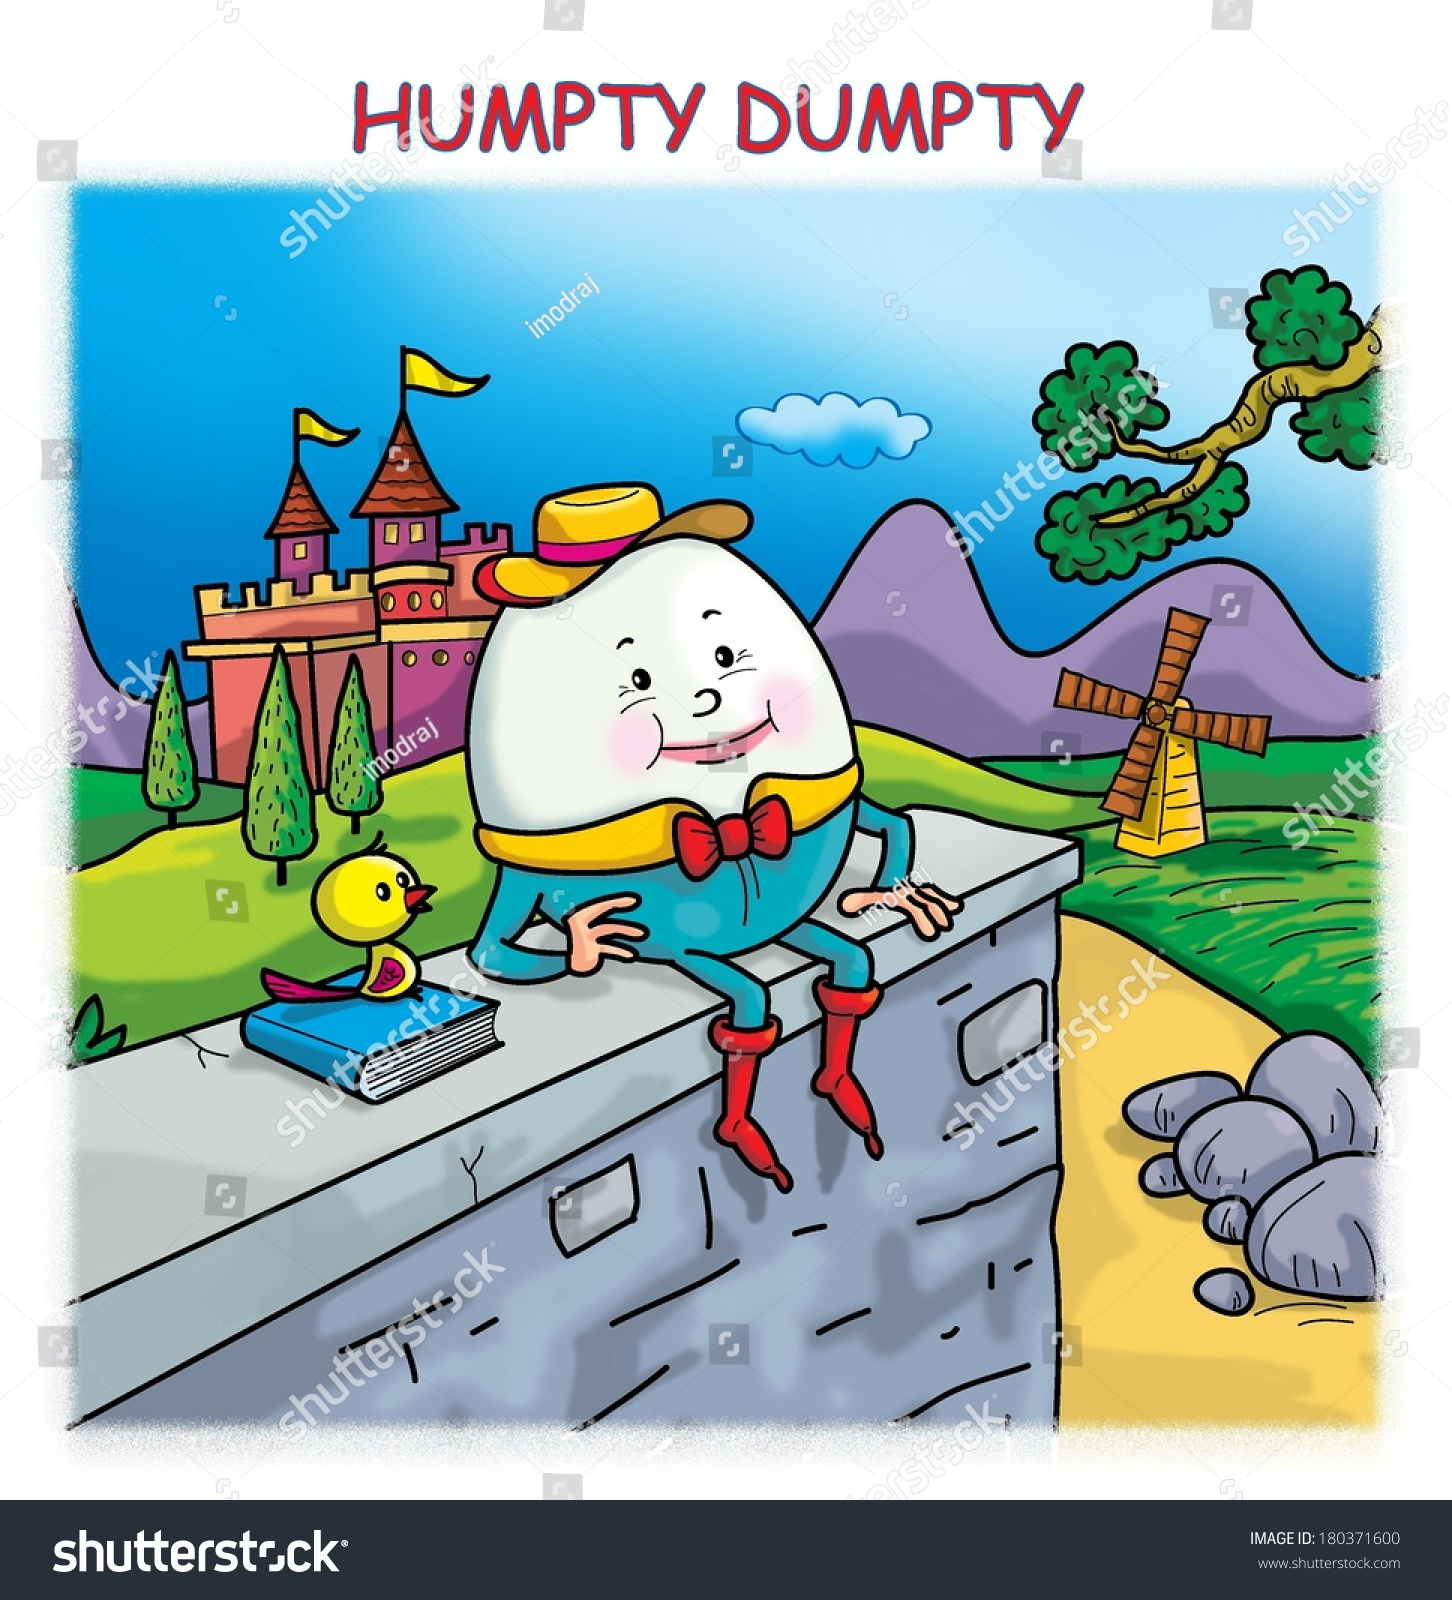 Humpty Dumpty Stock Photo Shutterstock